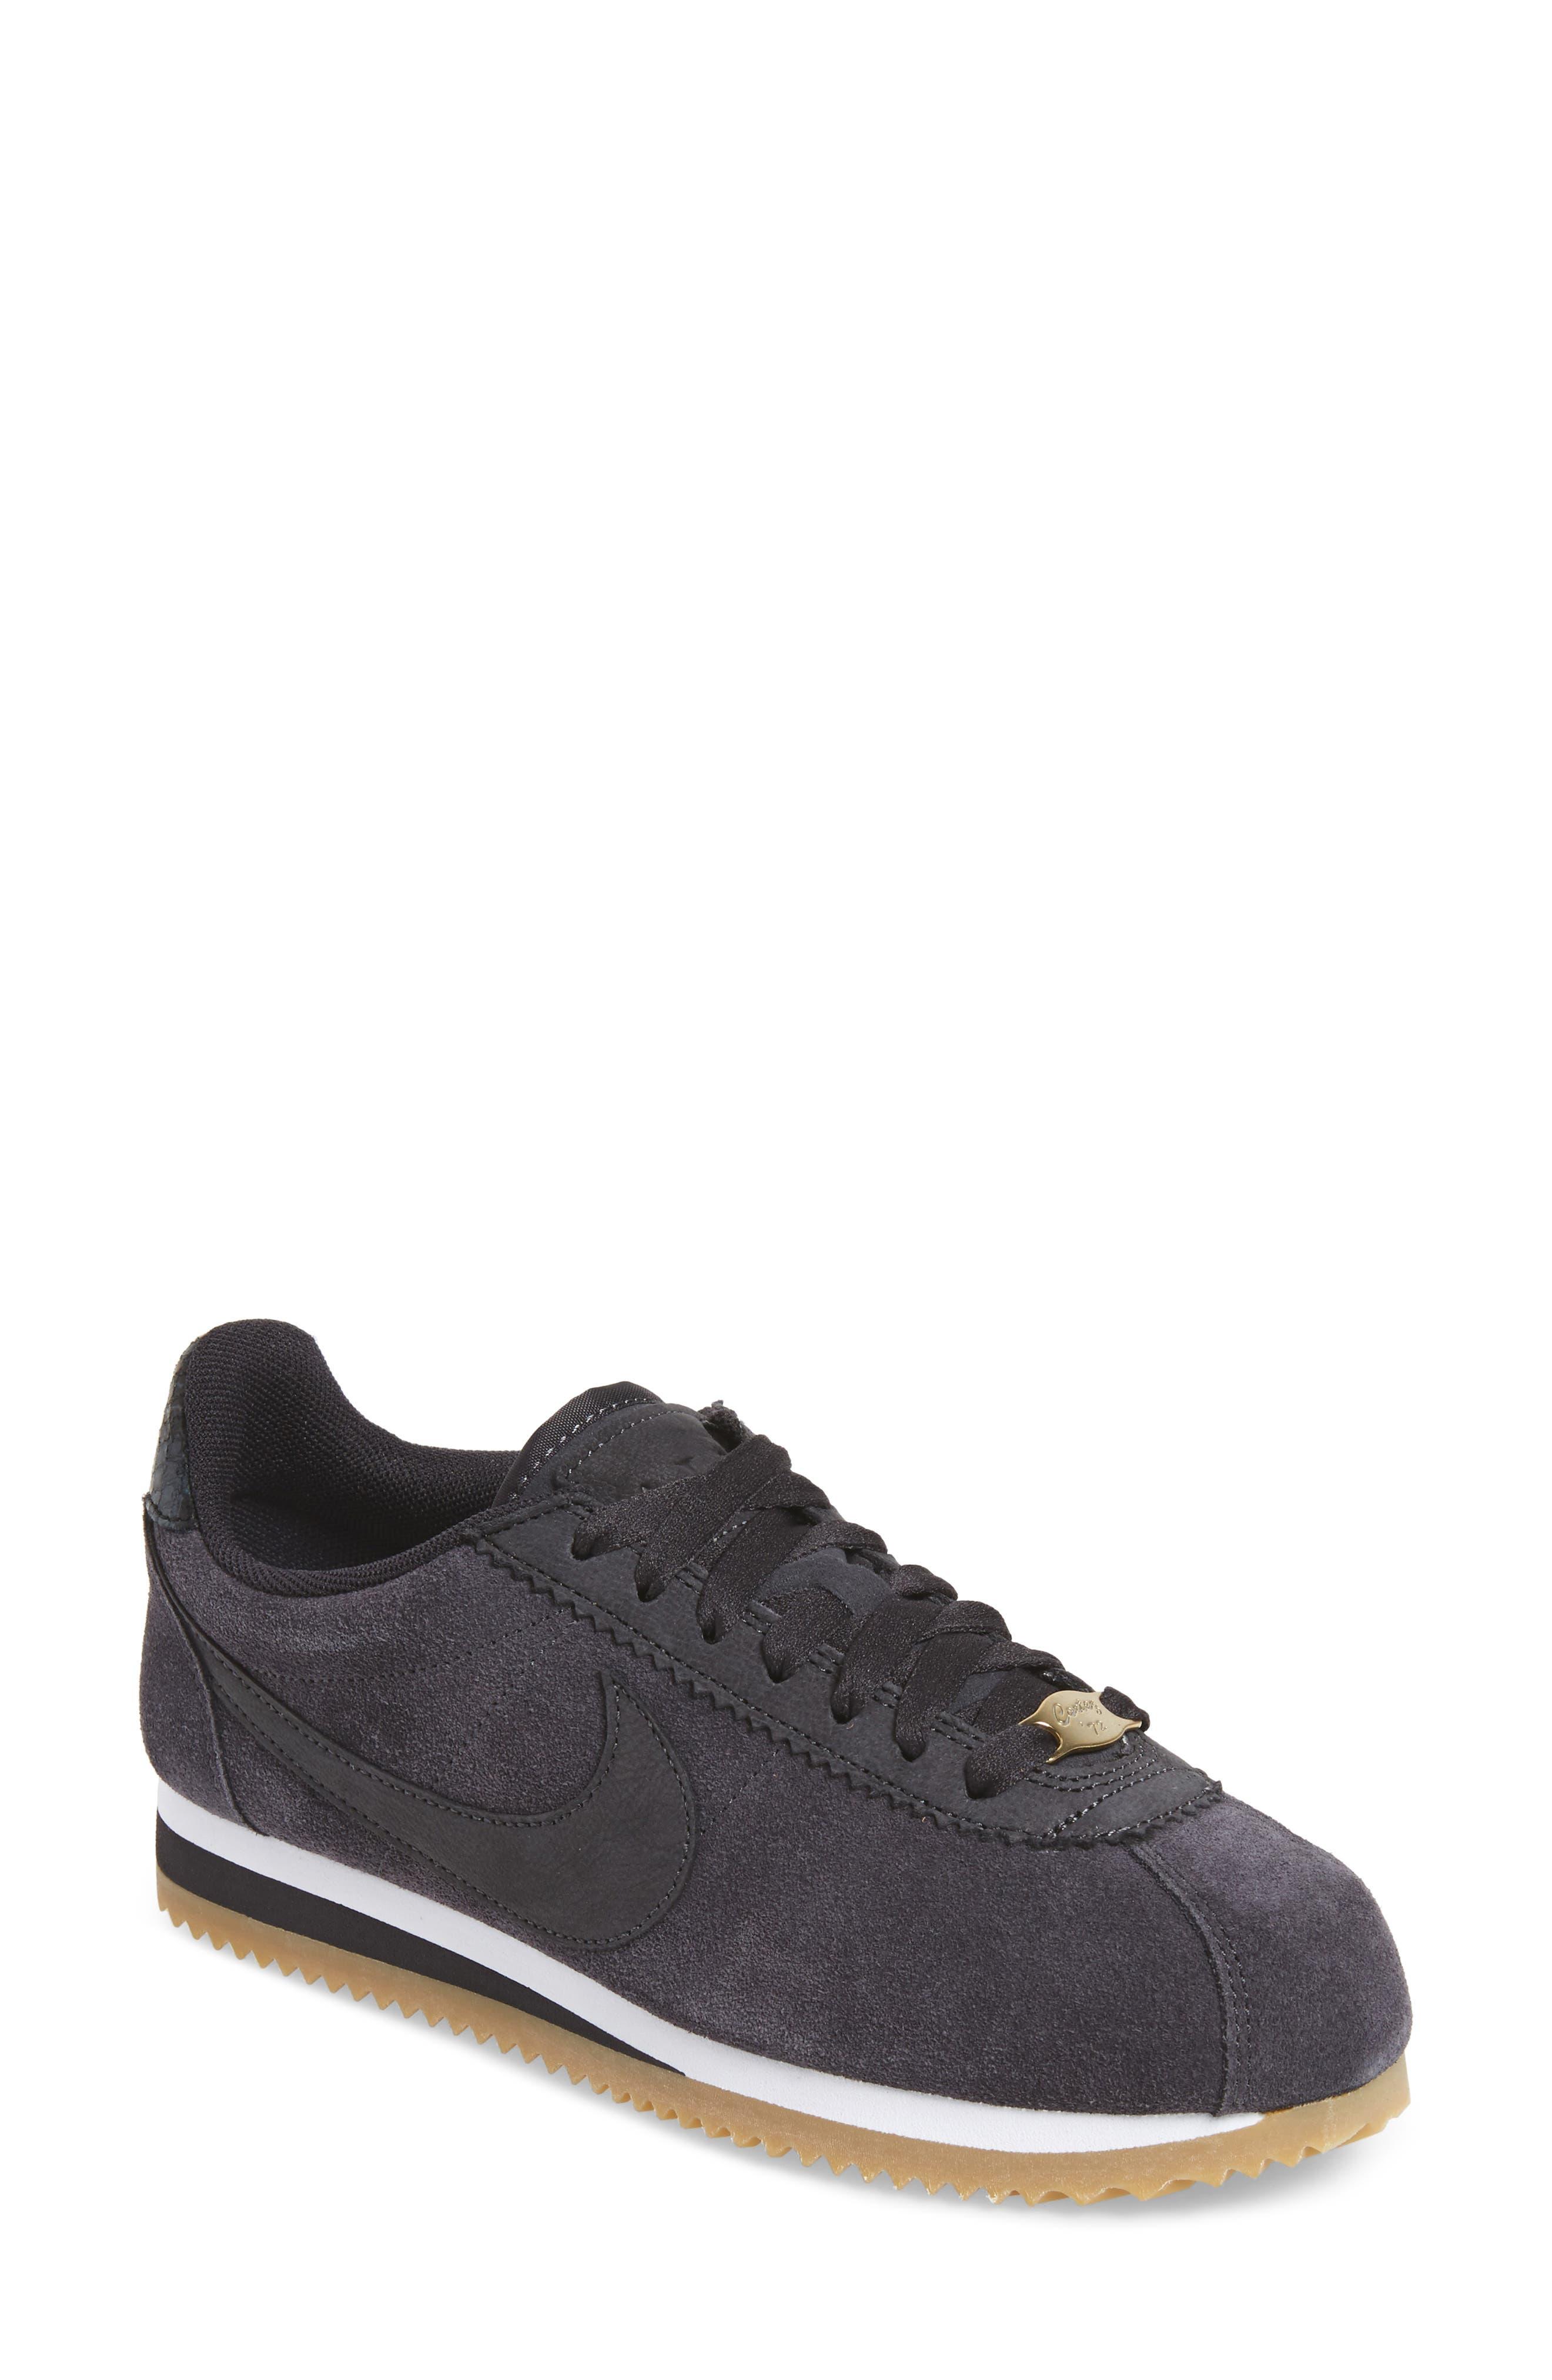 x A.L.C. Classic Cortez Sneaker,                         Main,                         color, 001